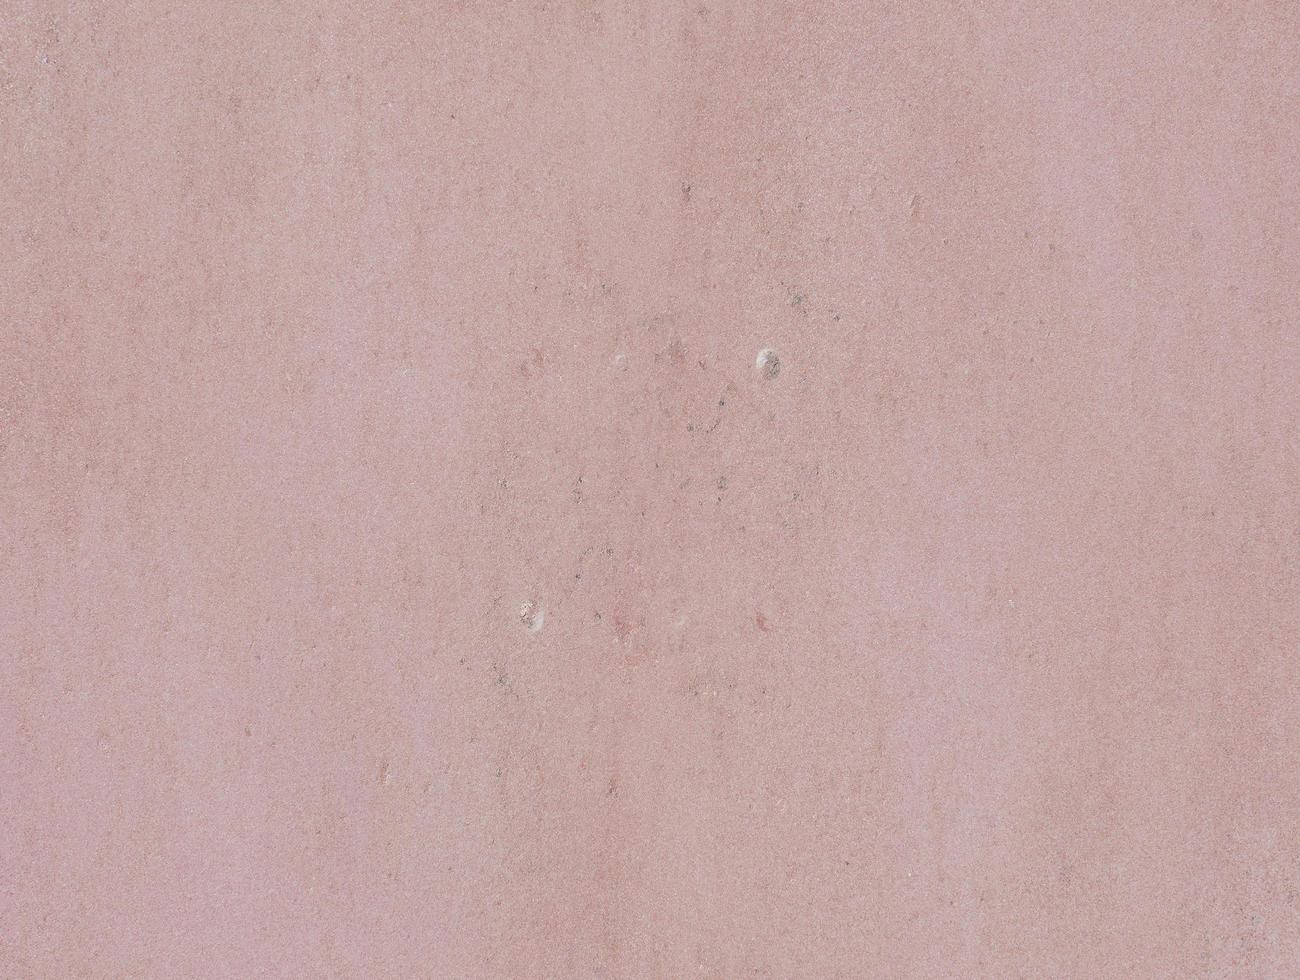 roze muur textuur foto